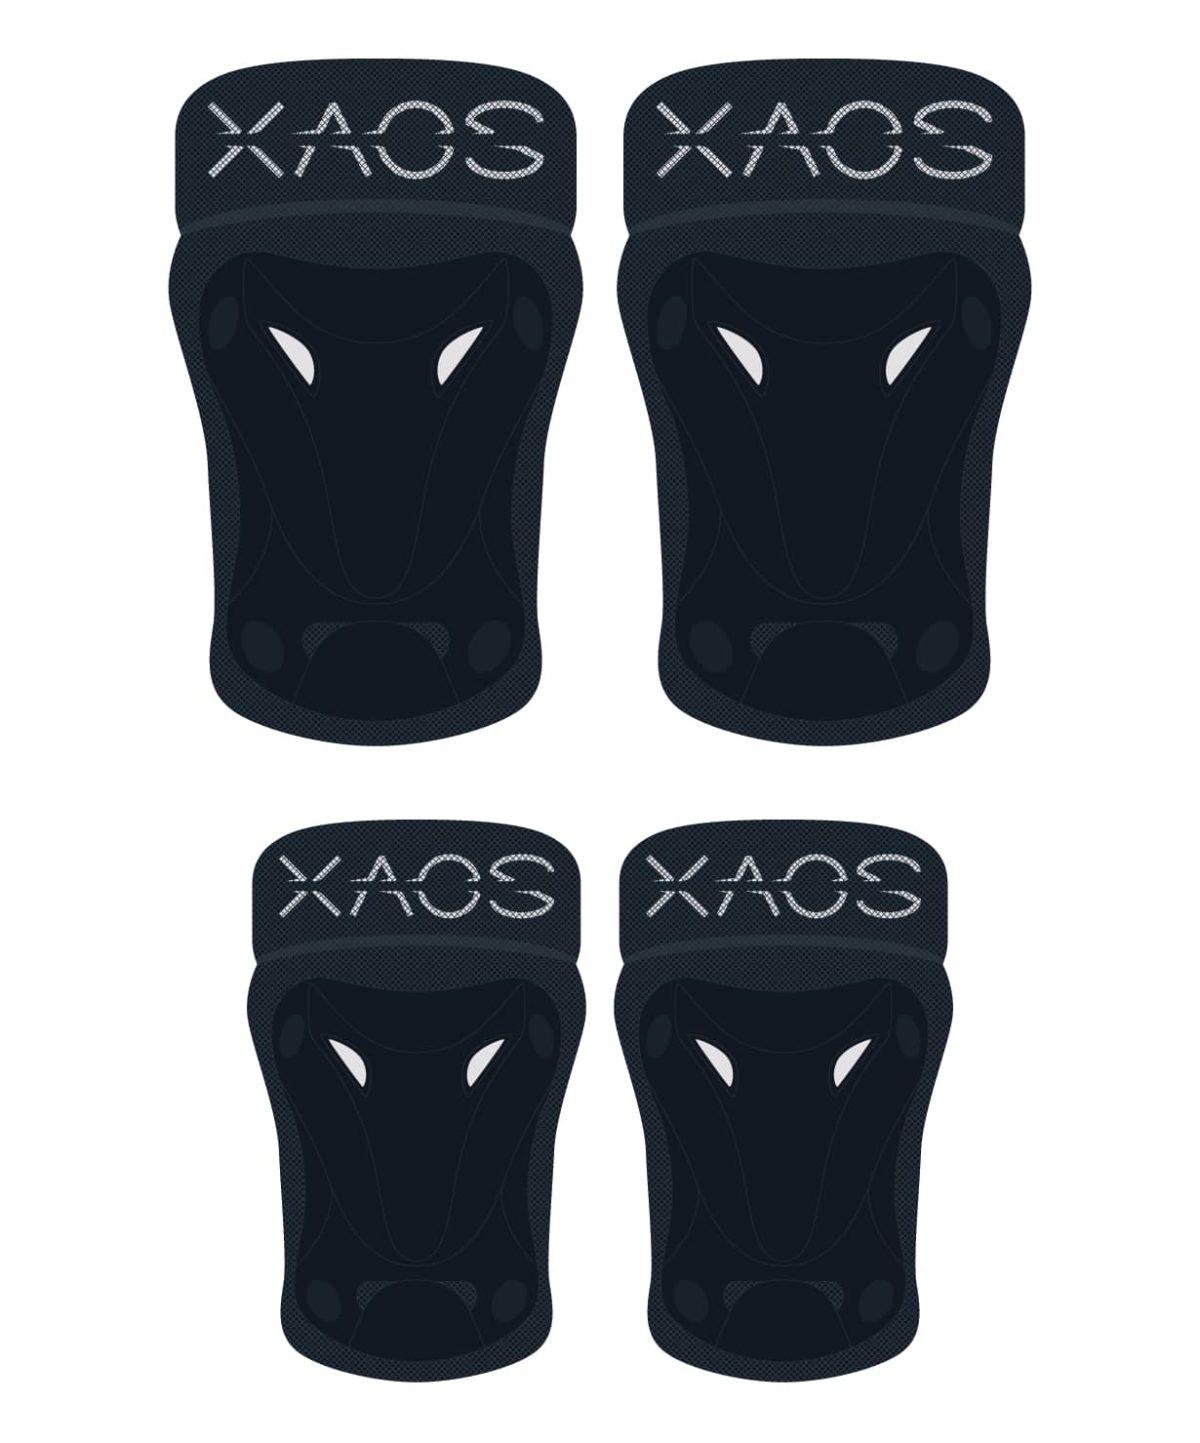 XAOS Ramp Blak Комплект защиты  19183 - 1